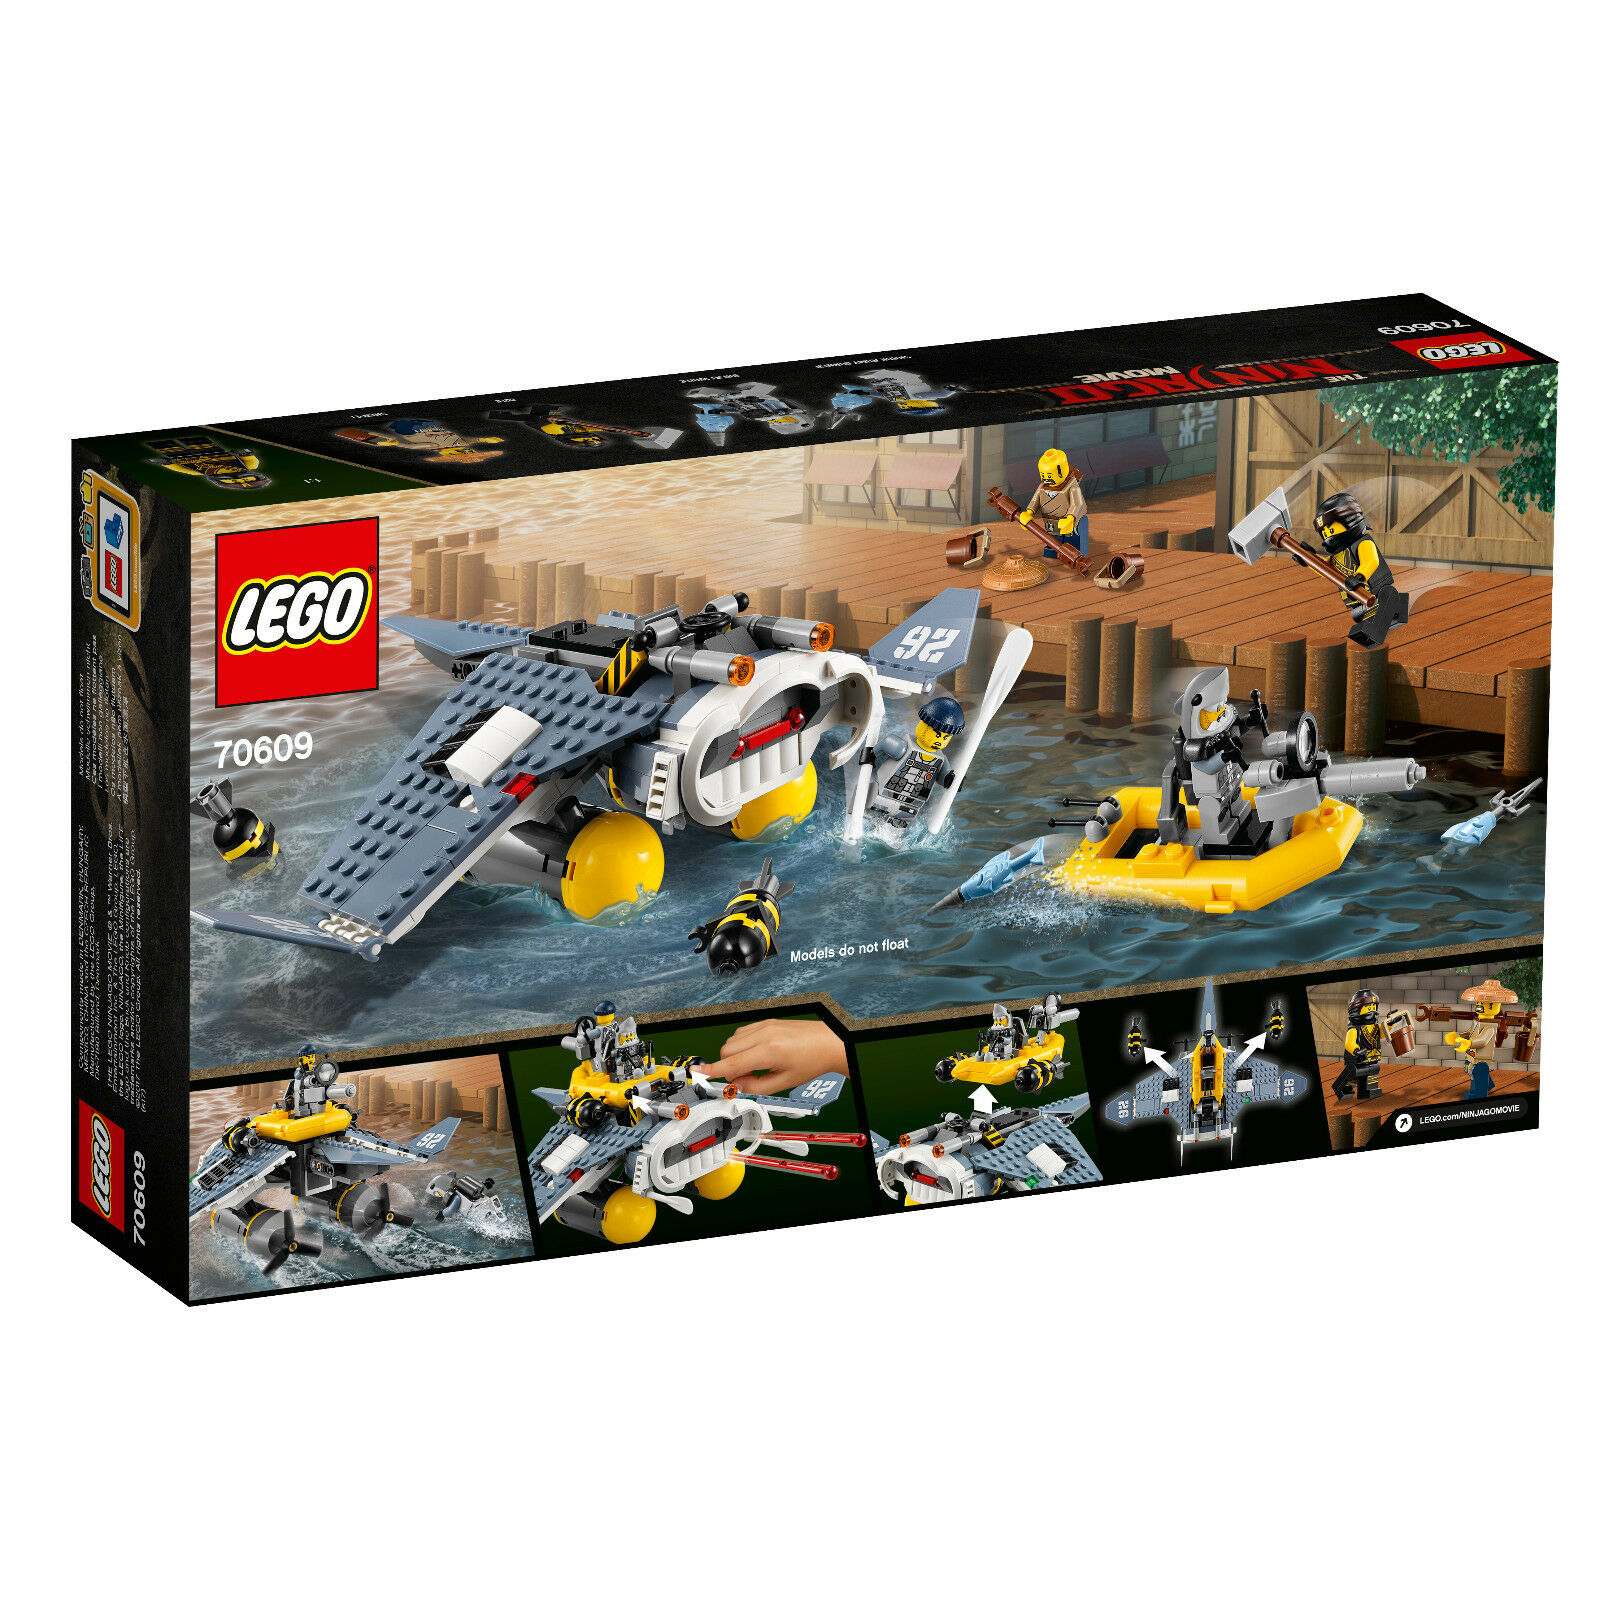 LEGO ® Ninjago Movie Set 10709 10709 10709 MANTA-Aviateur 1119d4